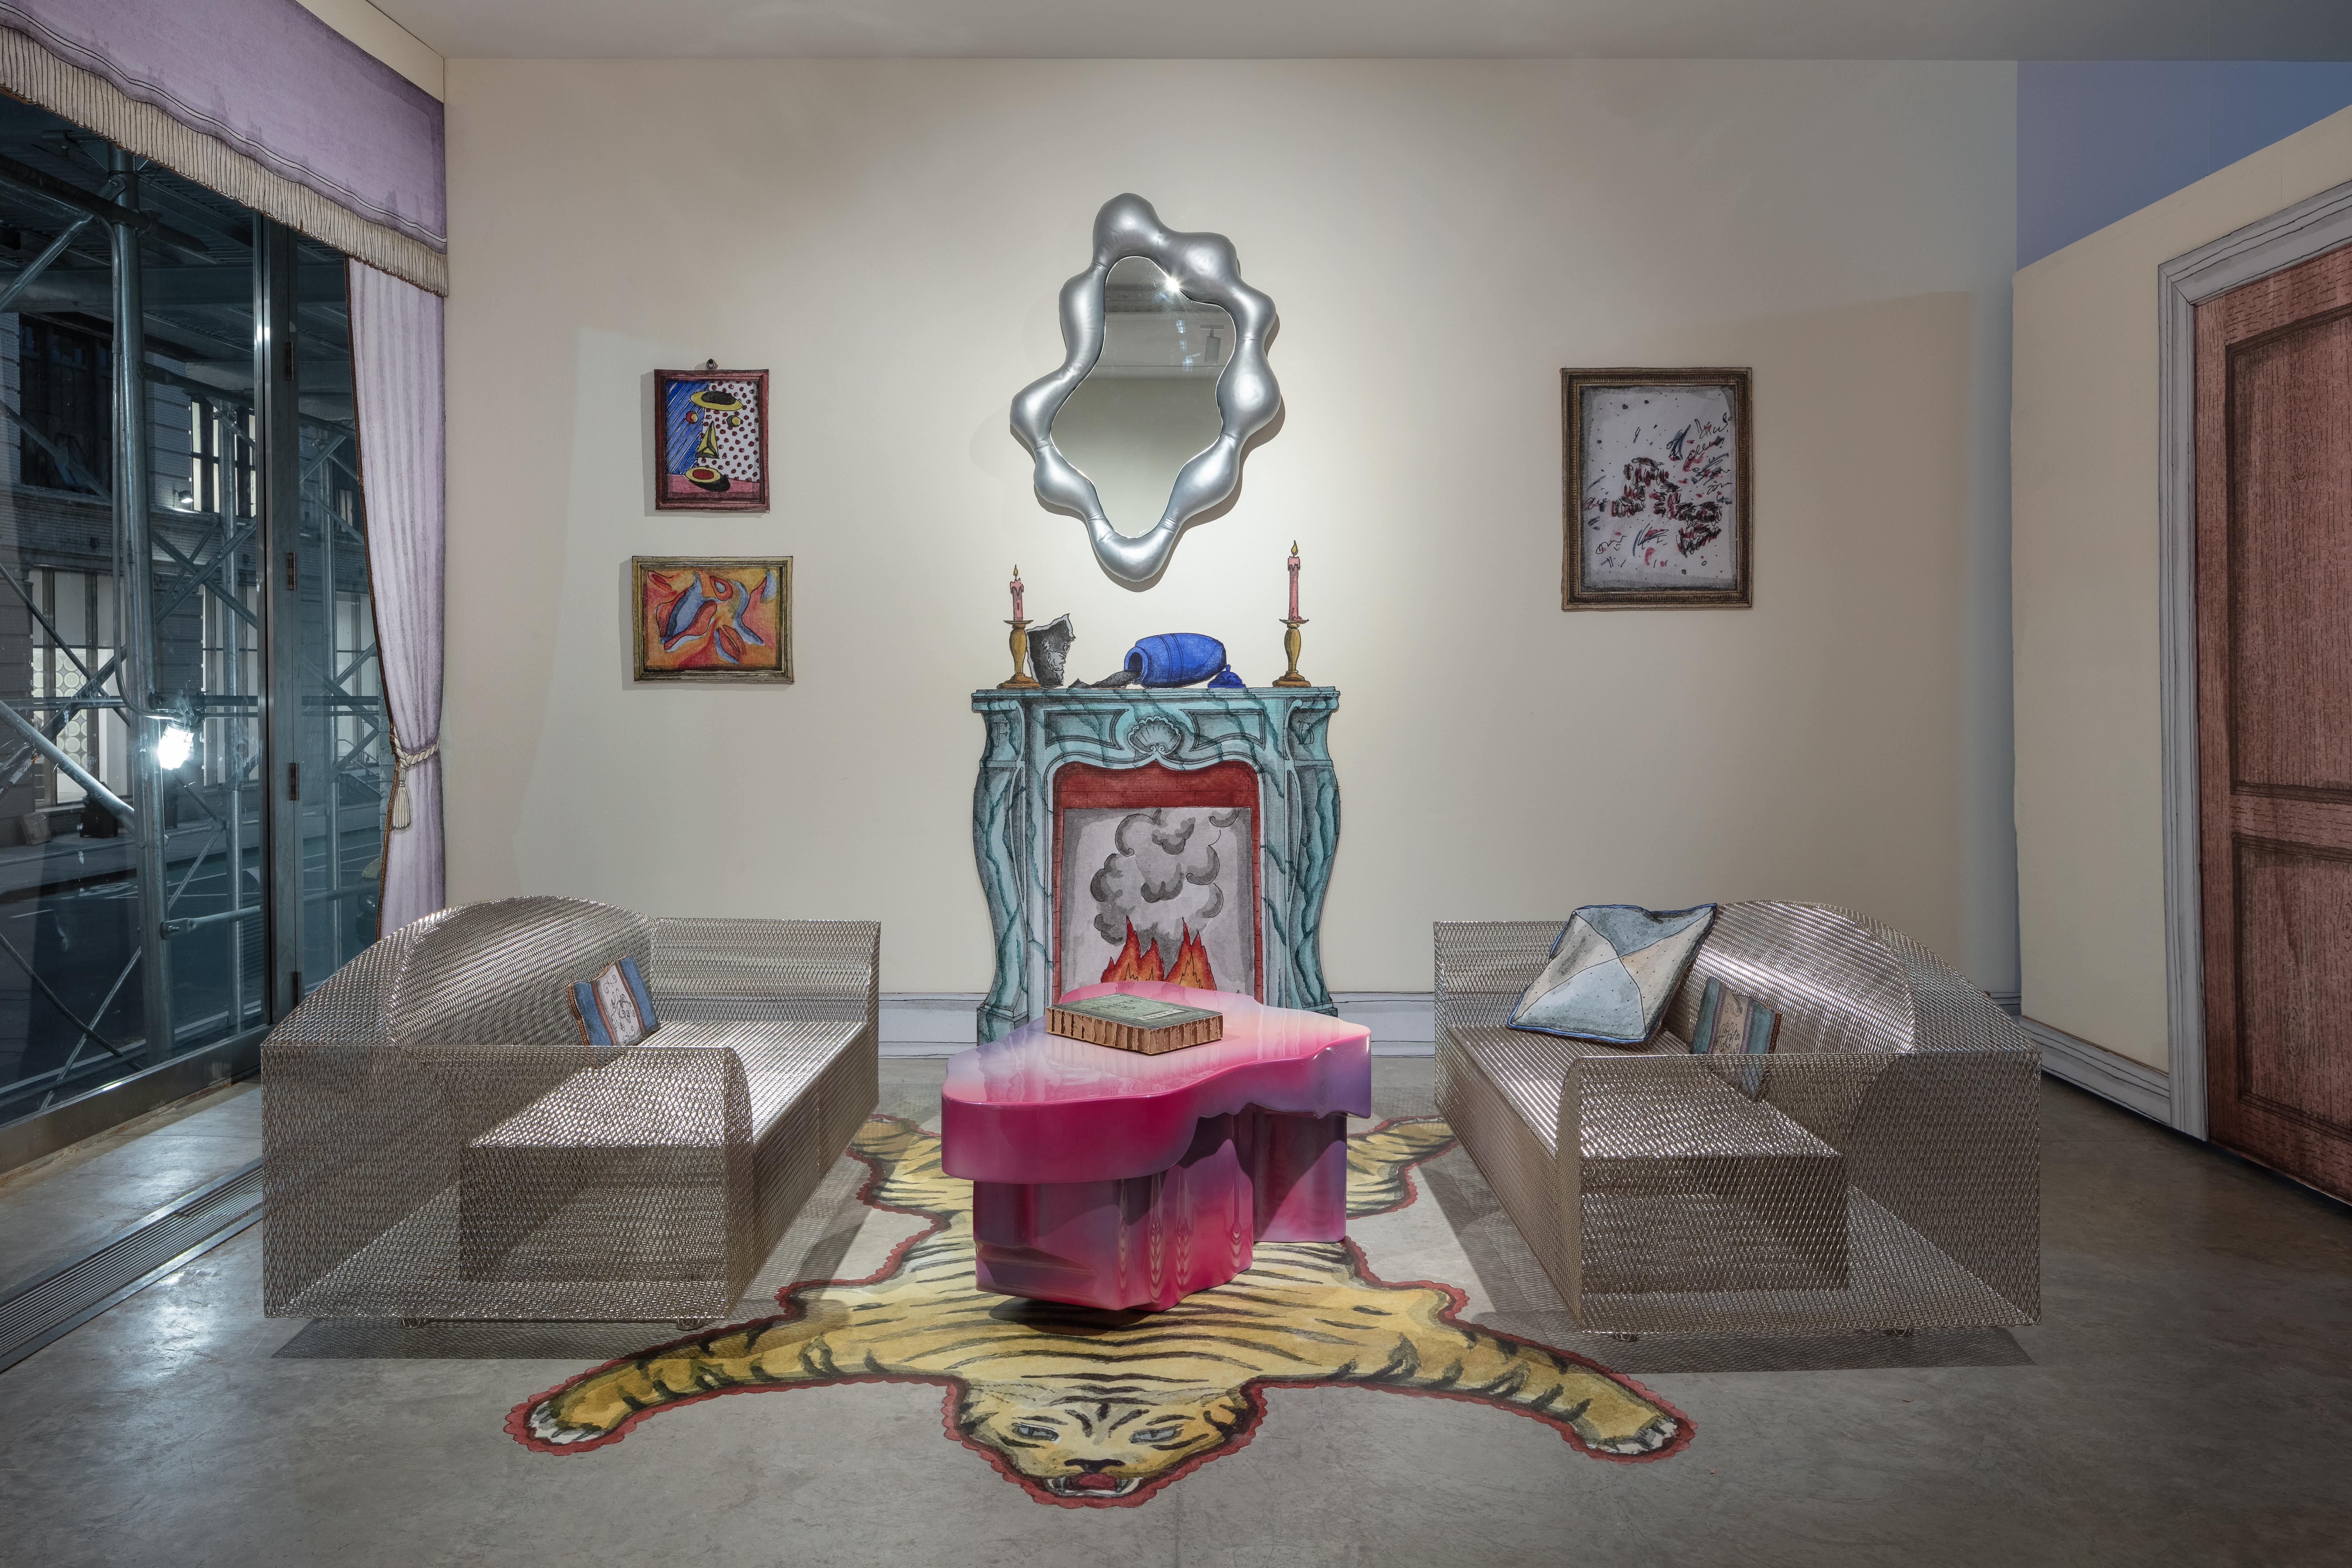 Friedman Benda Gallery